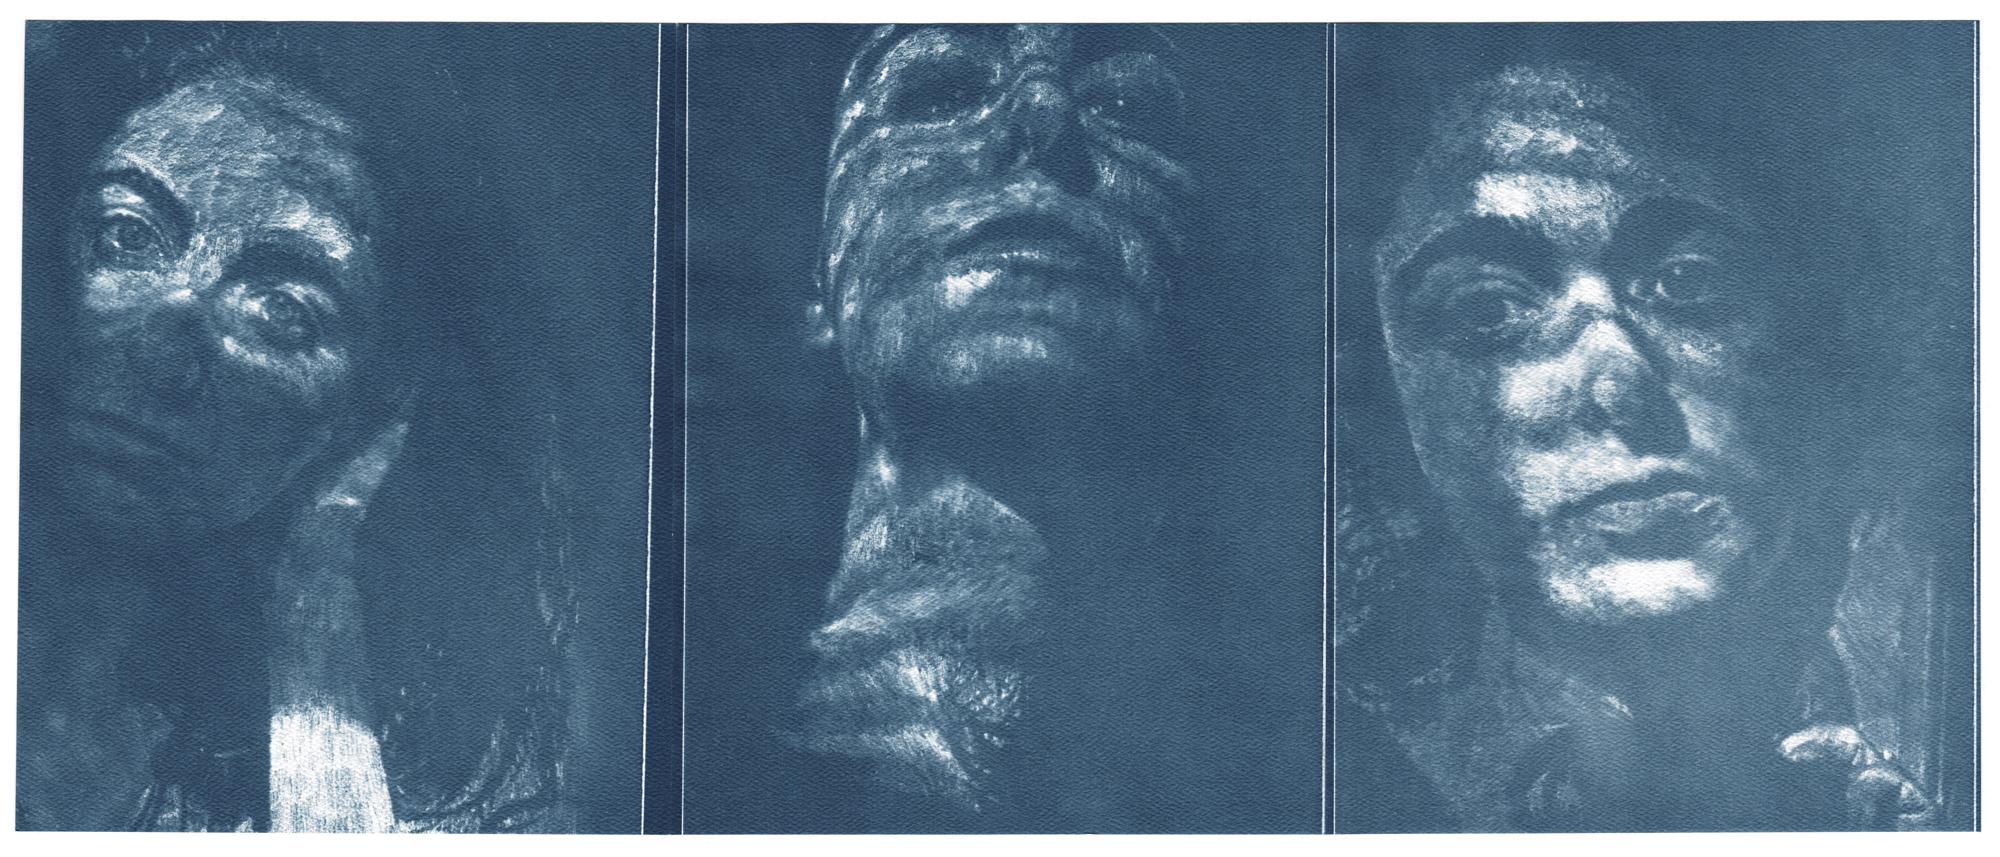 "Selfies between sneezes, cyanotype contact prints of graphite drawings on vellum, 10"" x 24"", 2015"